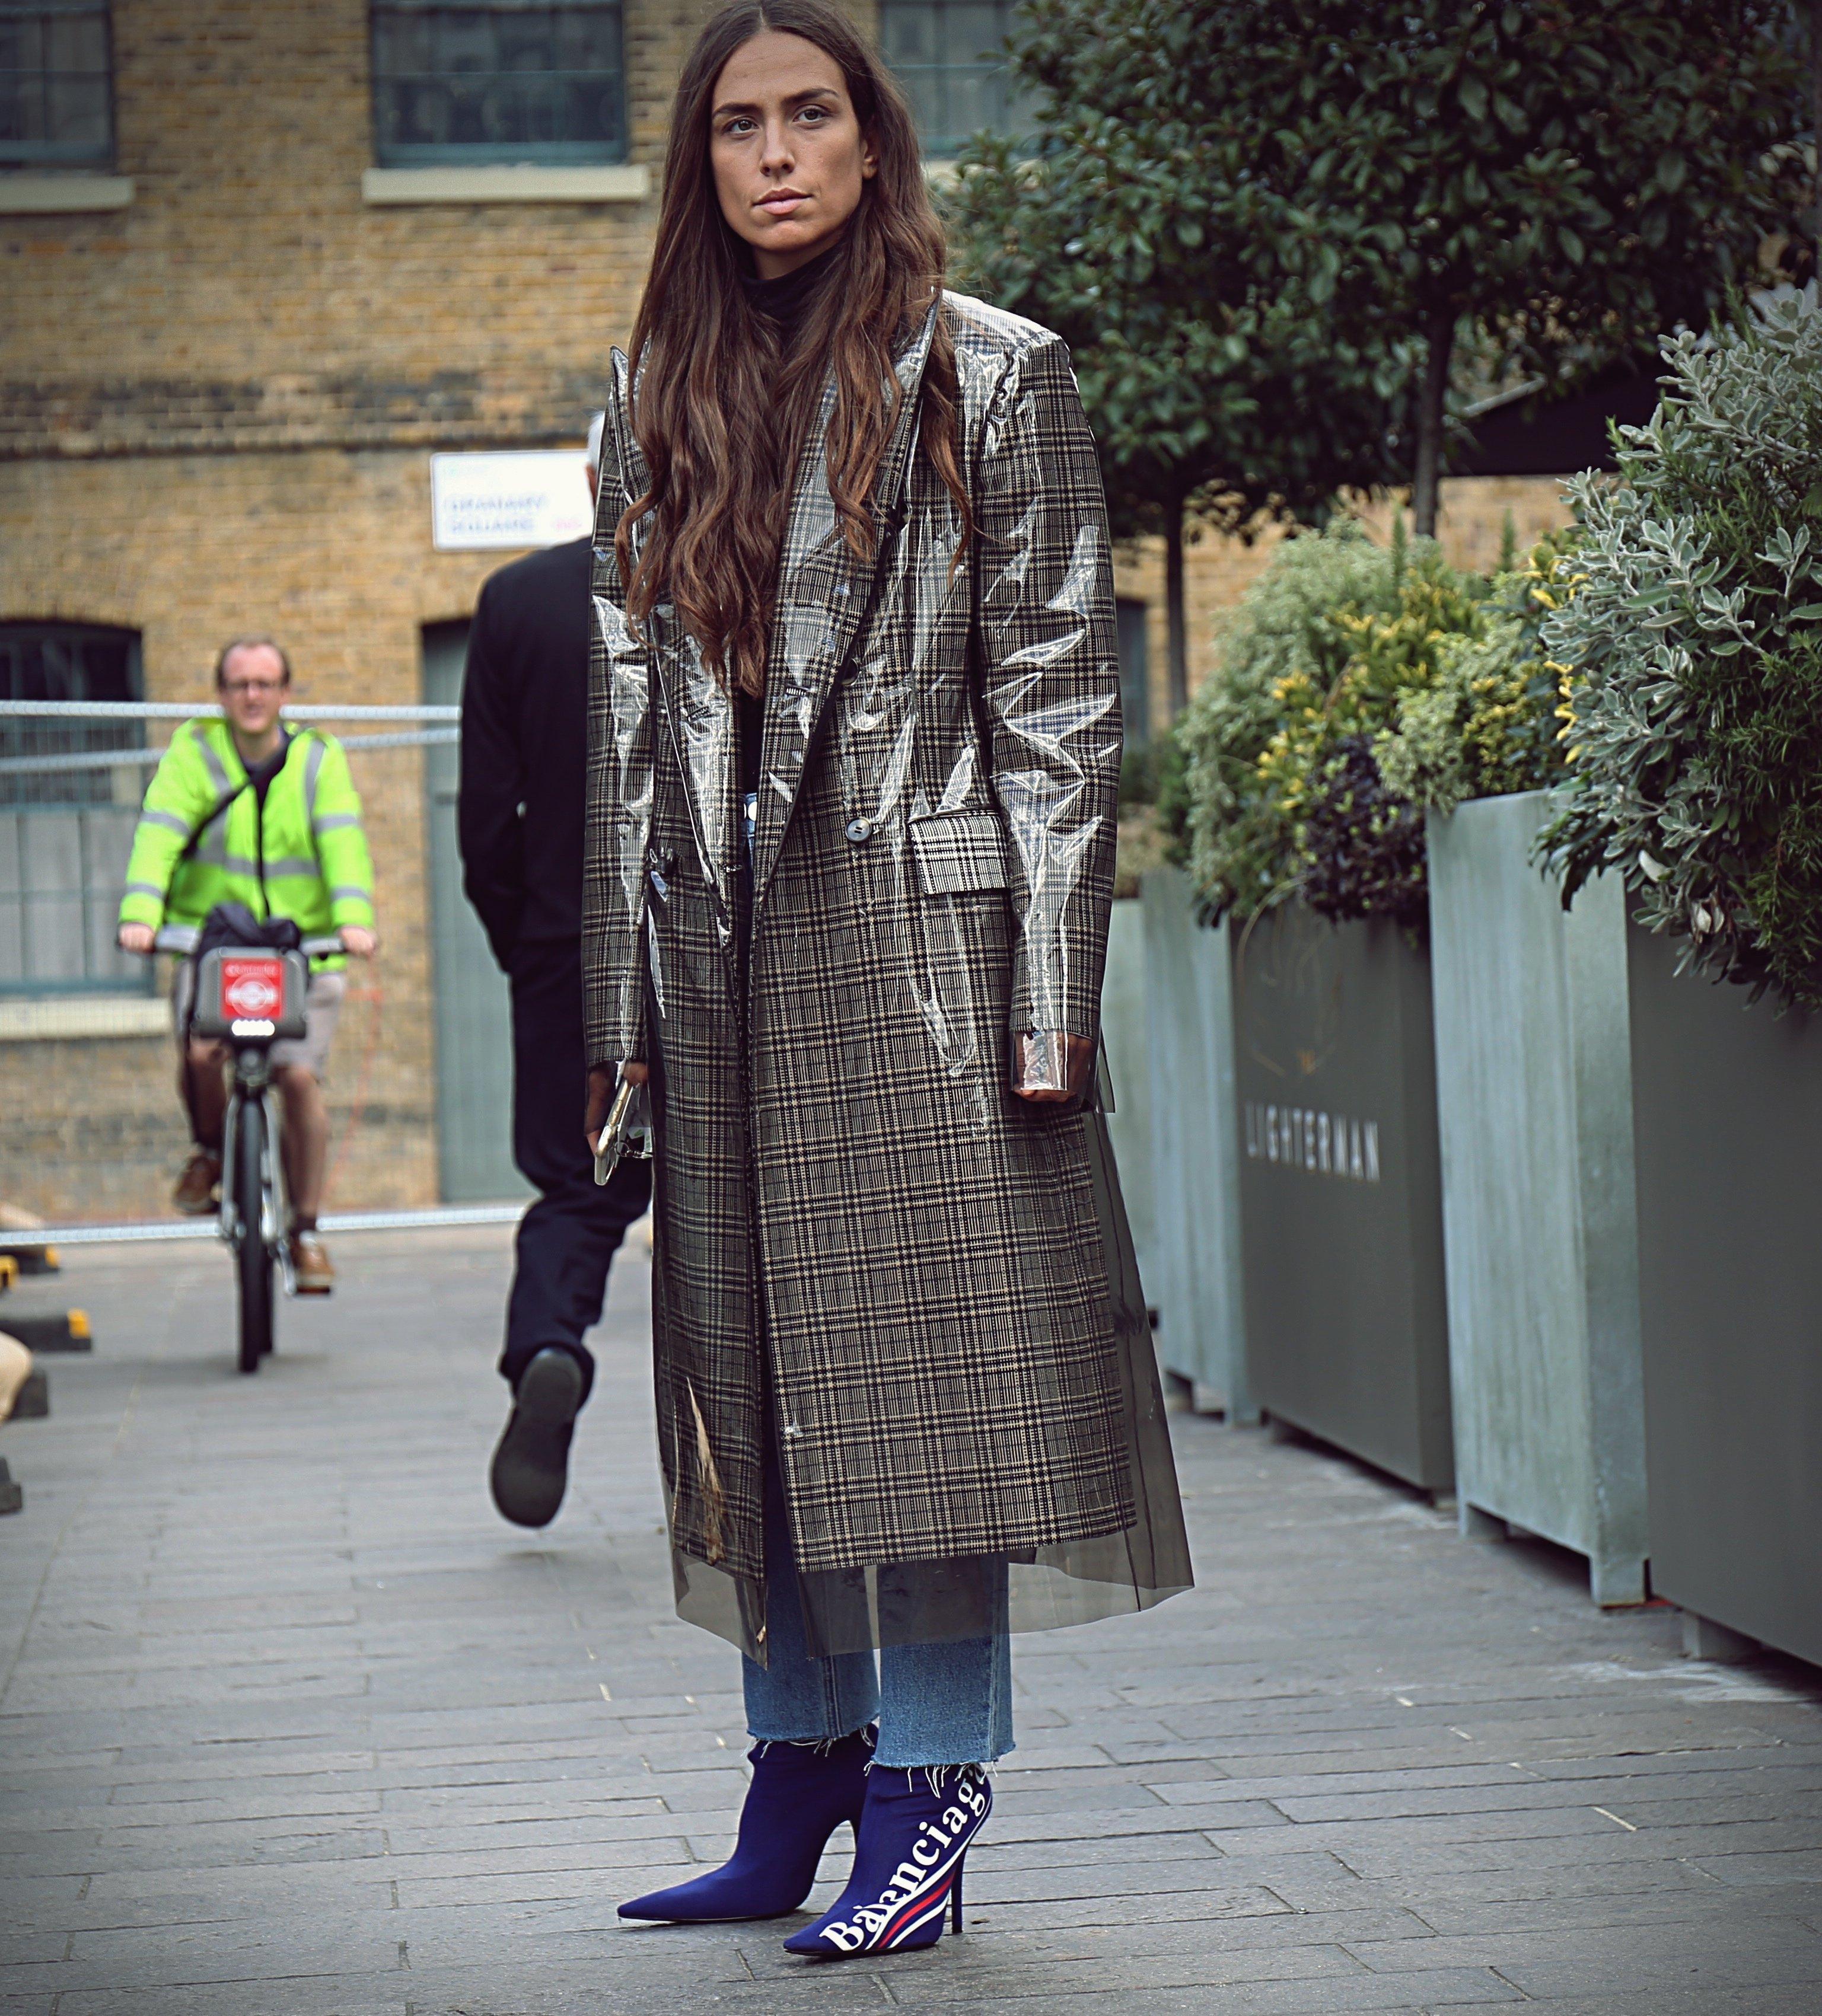 September 17, 2017 - London, United Kingdom - LONDON- 17 September 2017 Erika Boldrin on the street during the London Fashion Week, Image: 356045187, License: Rights-managed, Restrictions: , Model Release: no, Credit line: Profimedia, Zuma Press - Entertaiment